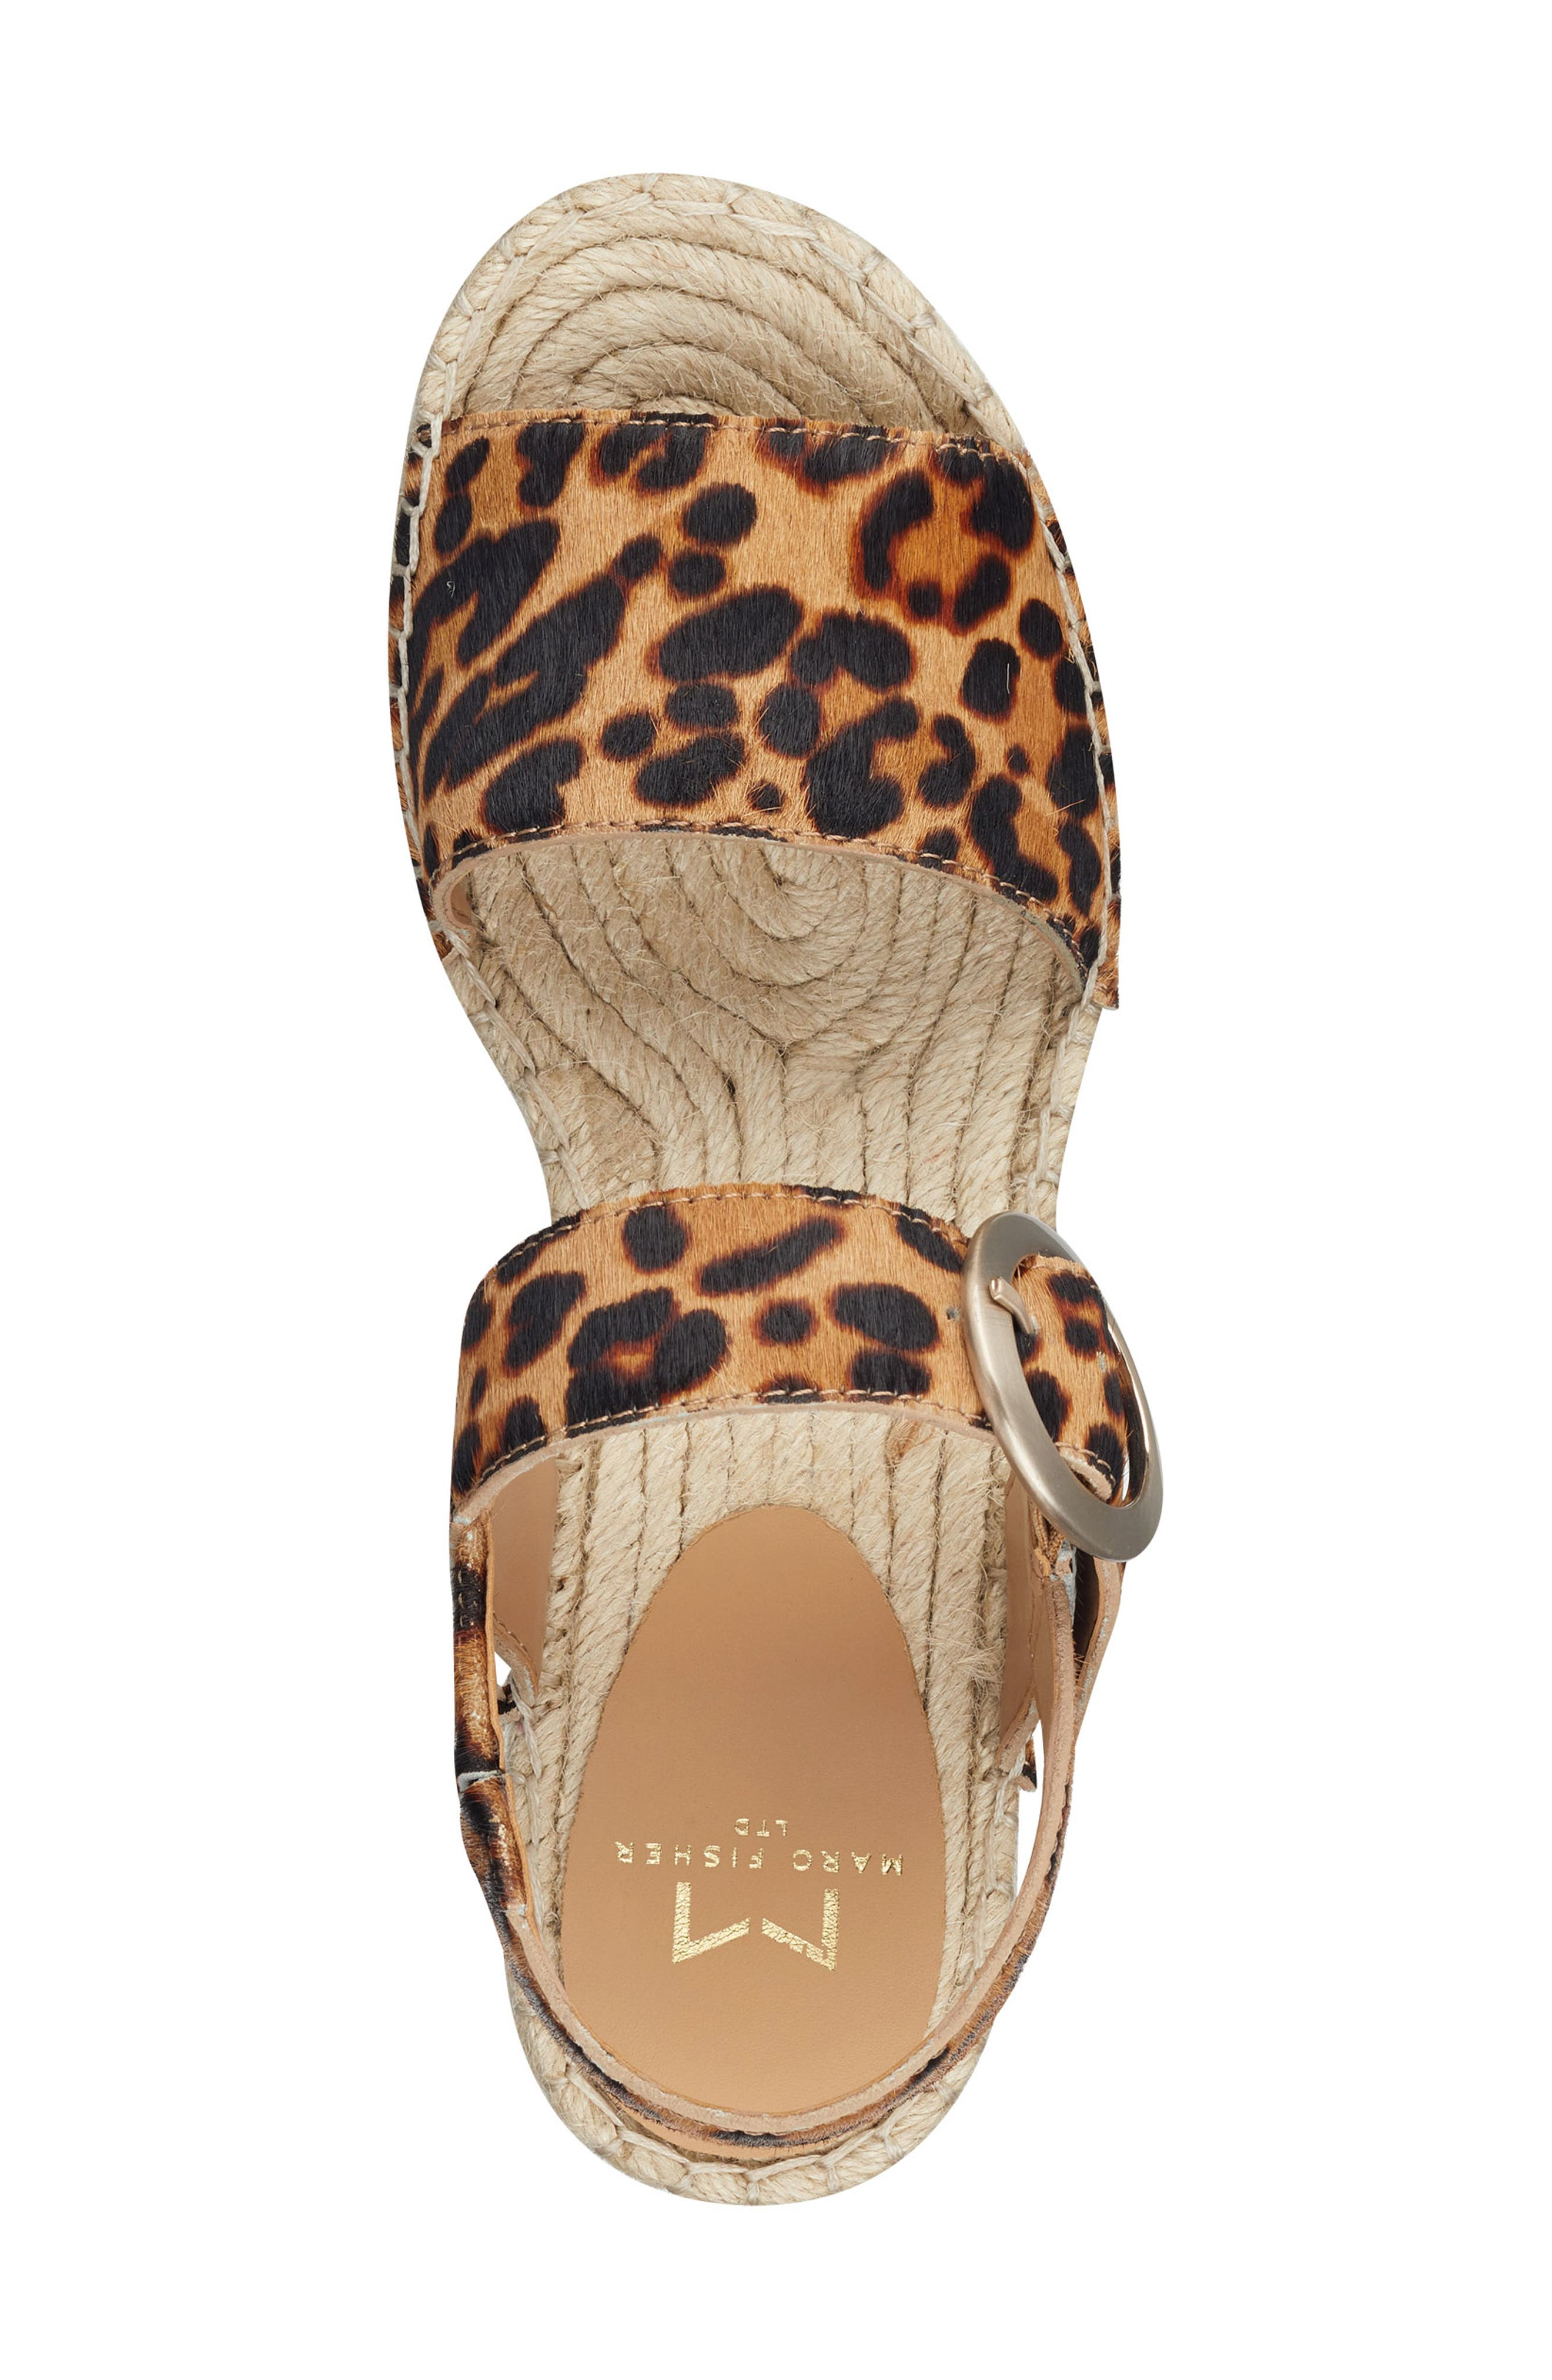 MARC FISHER LTD,                             Rexly Espadrille Platform Sandal,                             Alternate thumbnail 5, color,                             LEOPARD HAIR CALF